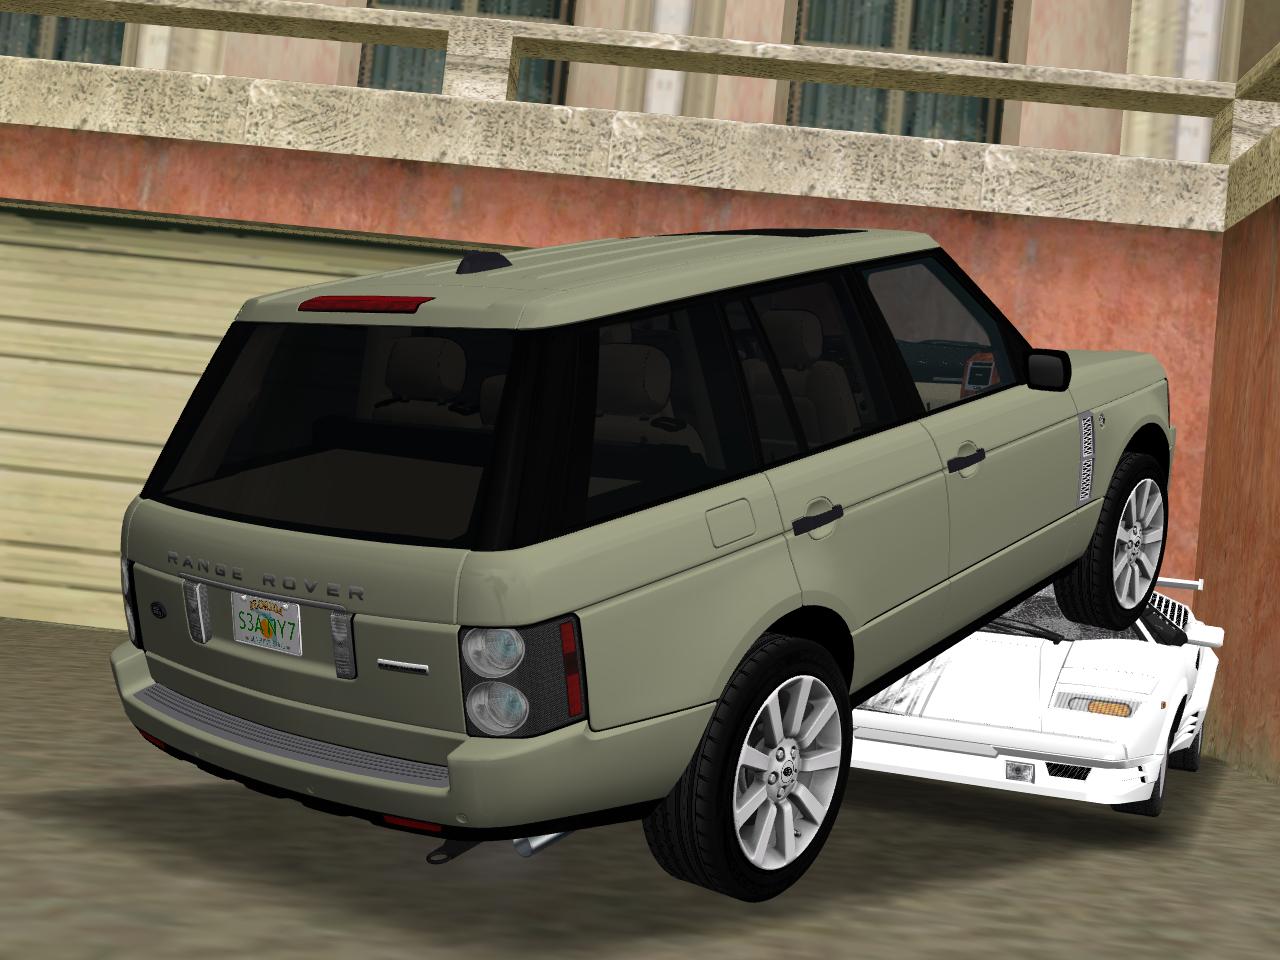 sean taiwan gta vc mods 2008 land rover range rover. Black Bedroom Furniture Sets. Home Design Ideas